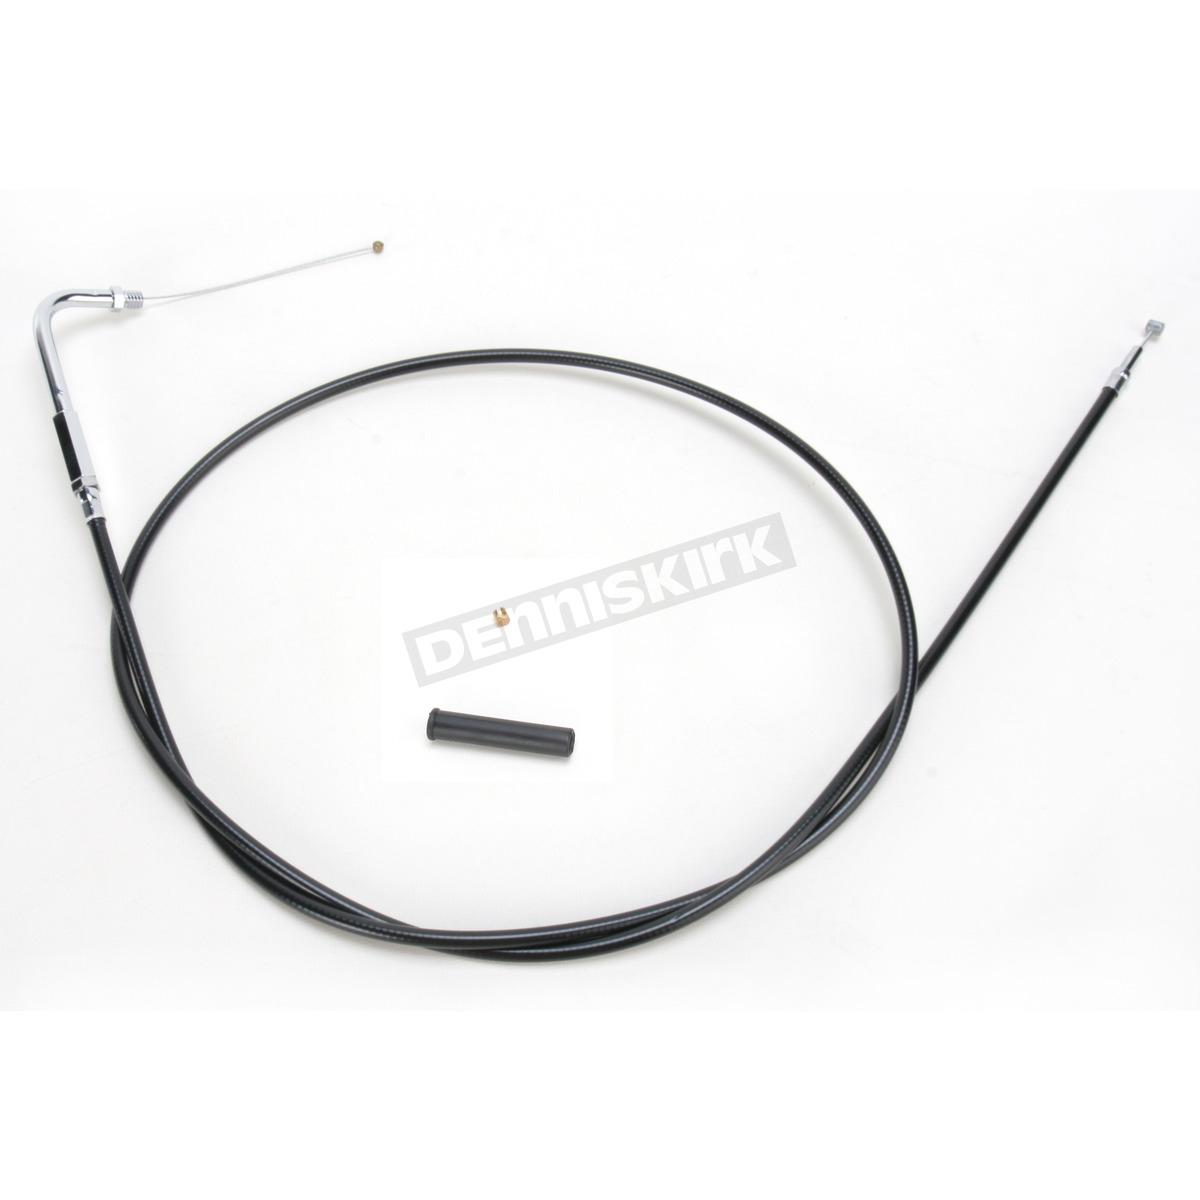 Drag Specialties Black Vinyl Throttle Cable W 90 Degree Elbow